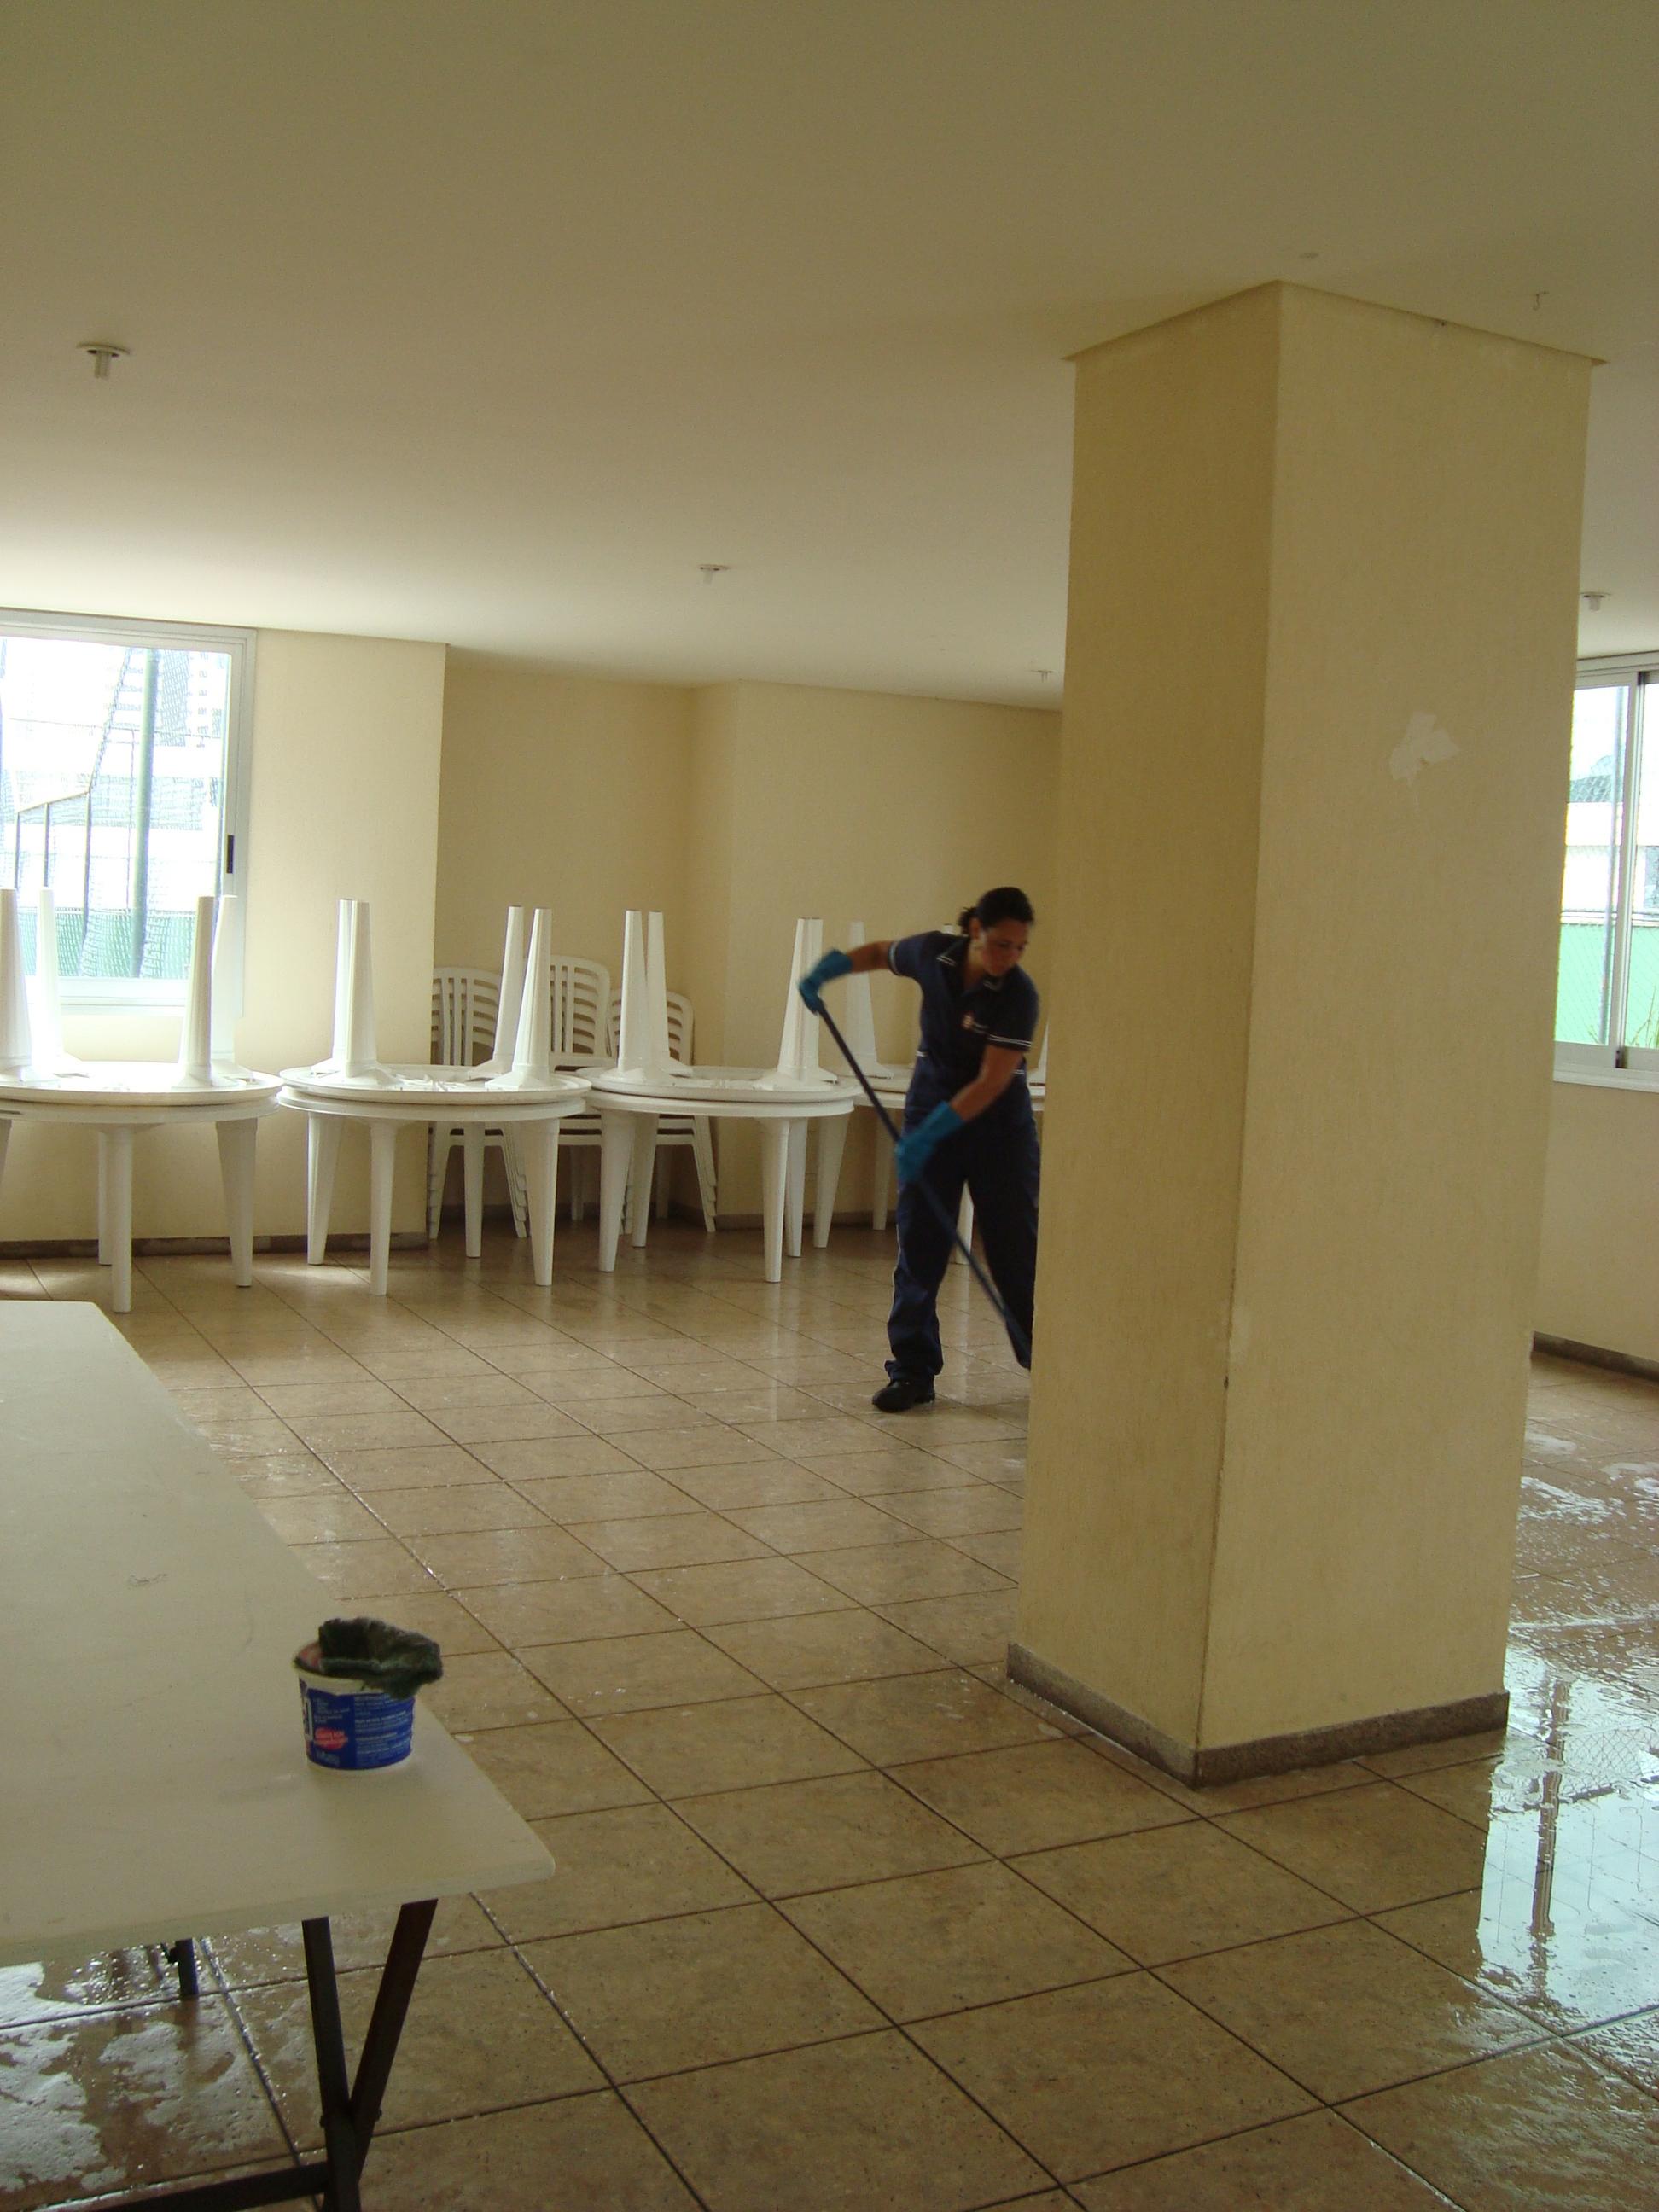 Limpeza é ponto crucial no combate ao vírus